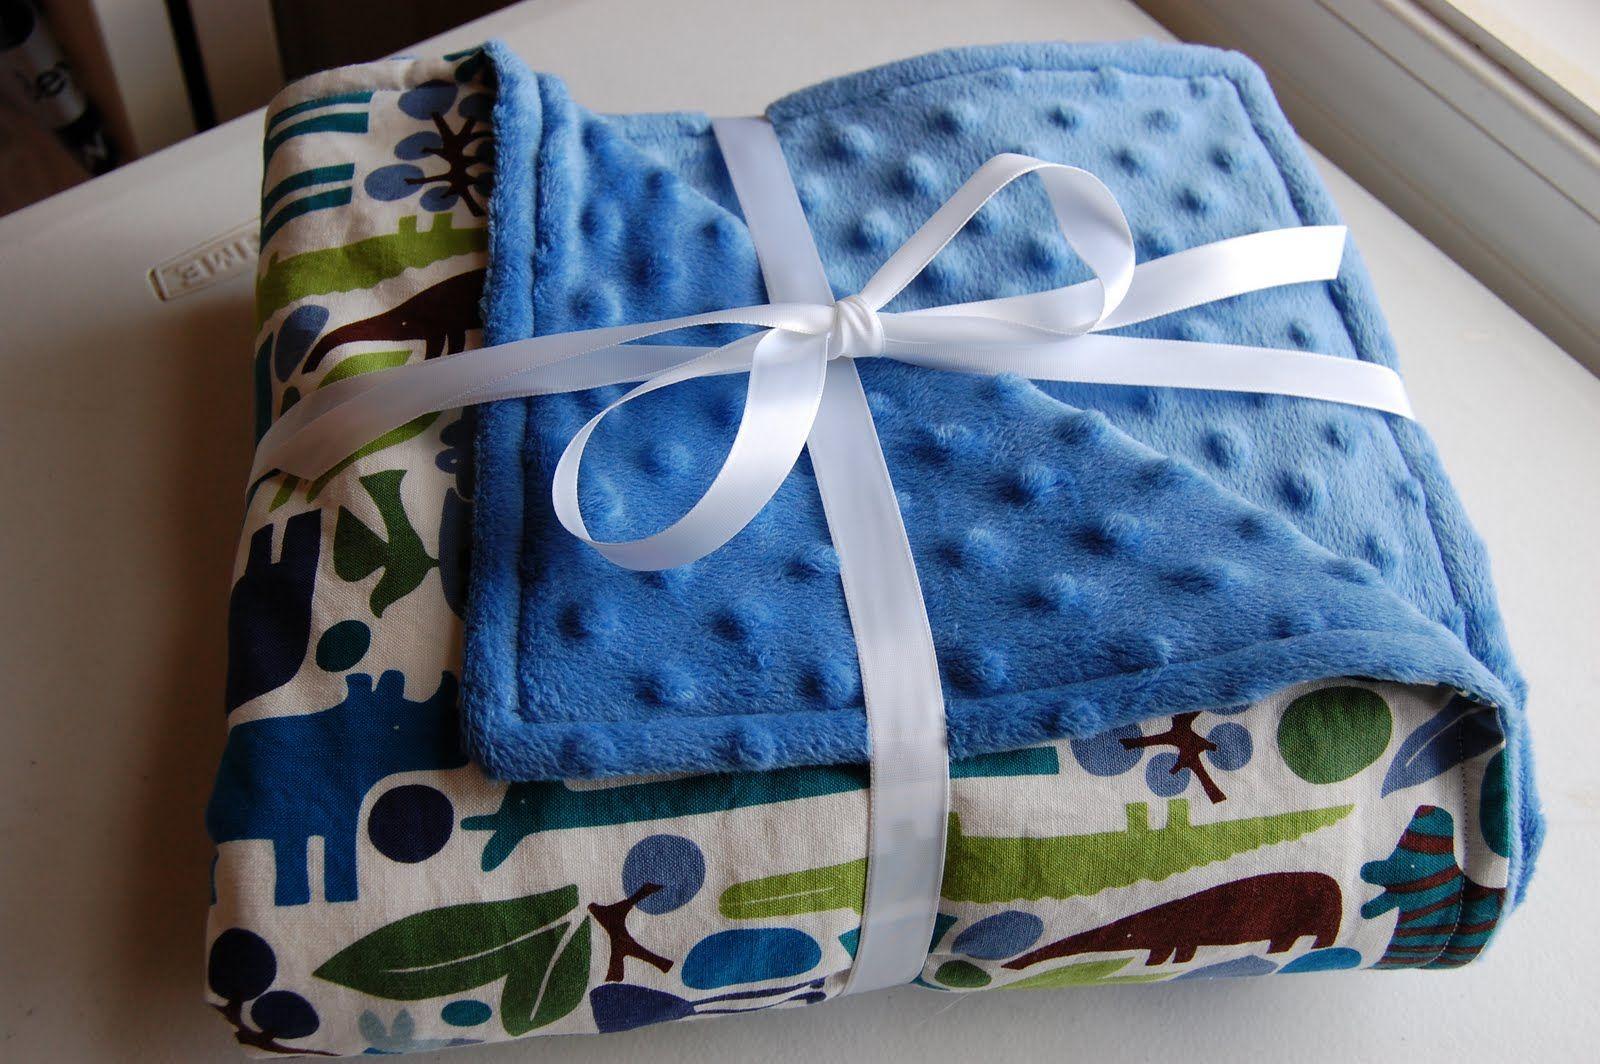 Homemade Baby Blanket Diy baby blanket, Baby blanket